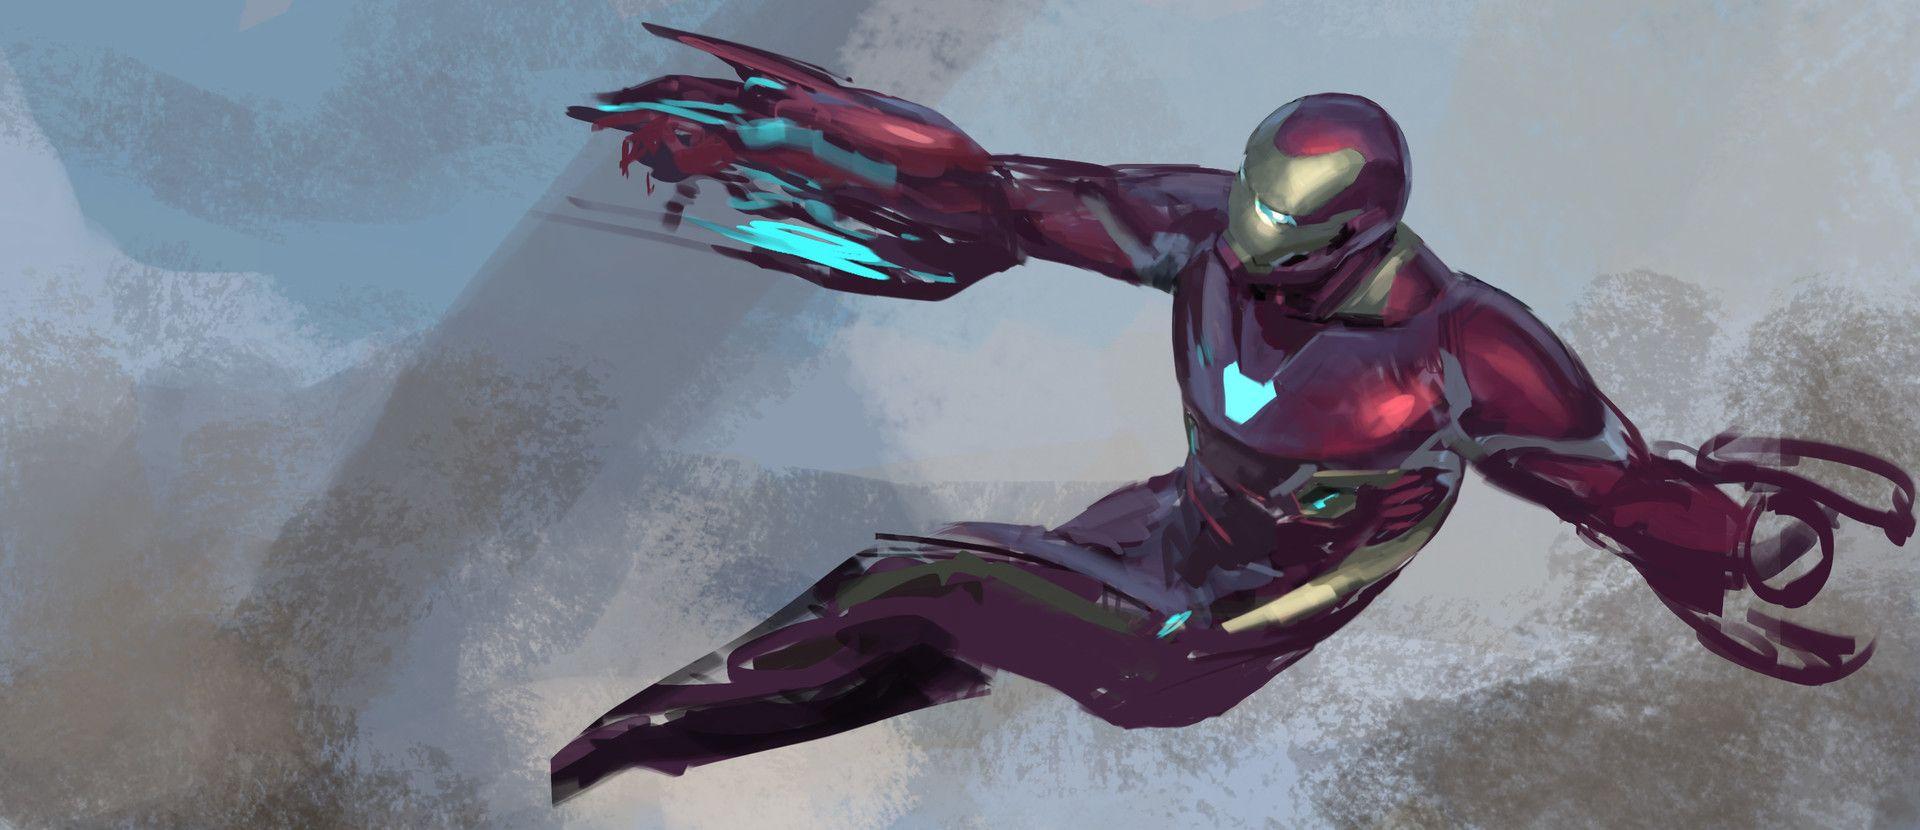 Artstation Avengers Infinity War Iron Man Mk50 On Titan Keyframe Phil Saunders Iron Man Poster Iron Man Avengers Iron Man Artwork